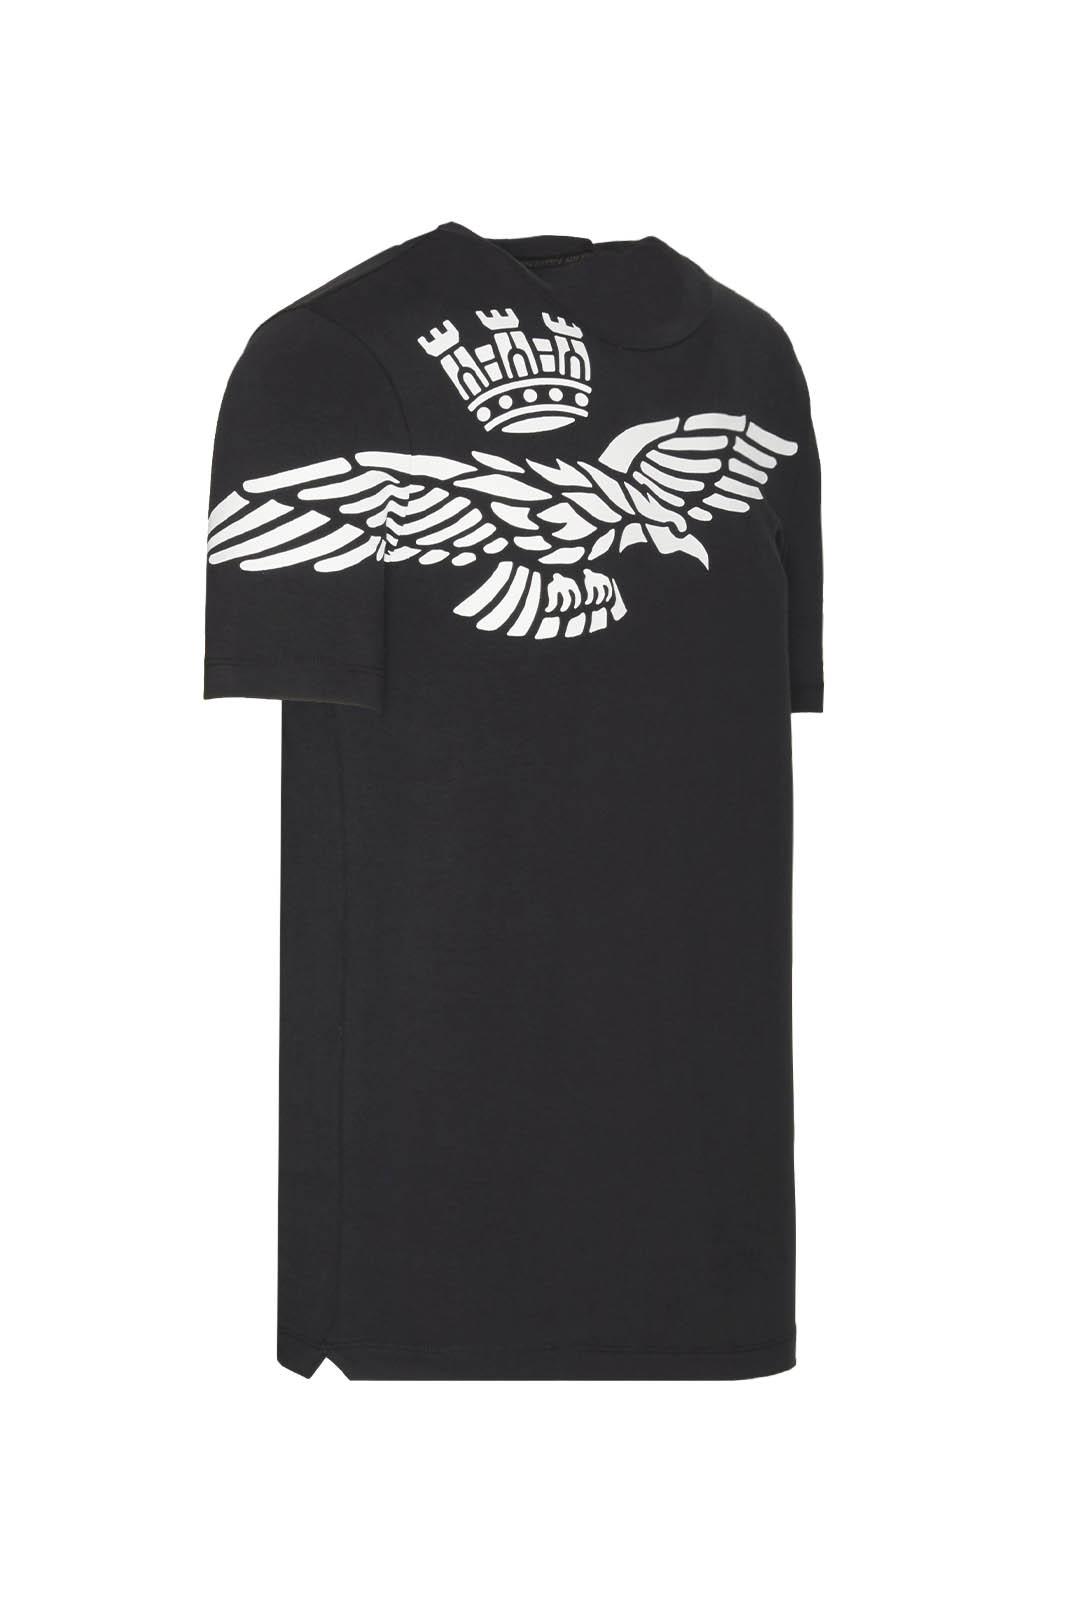 T-Shirt mit Adler Kontrastdruck          3